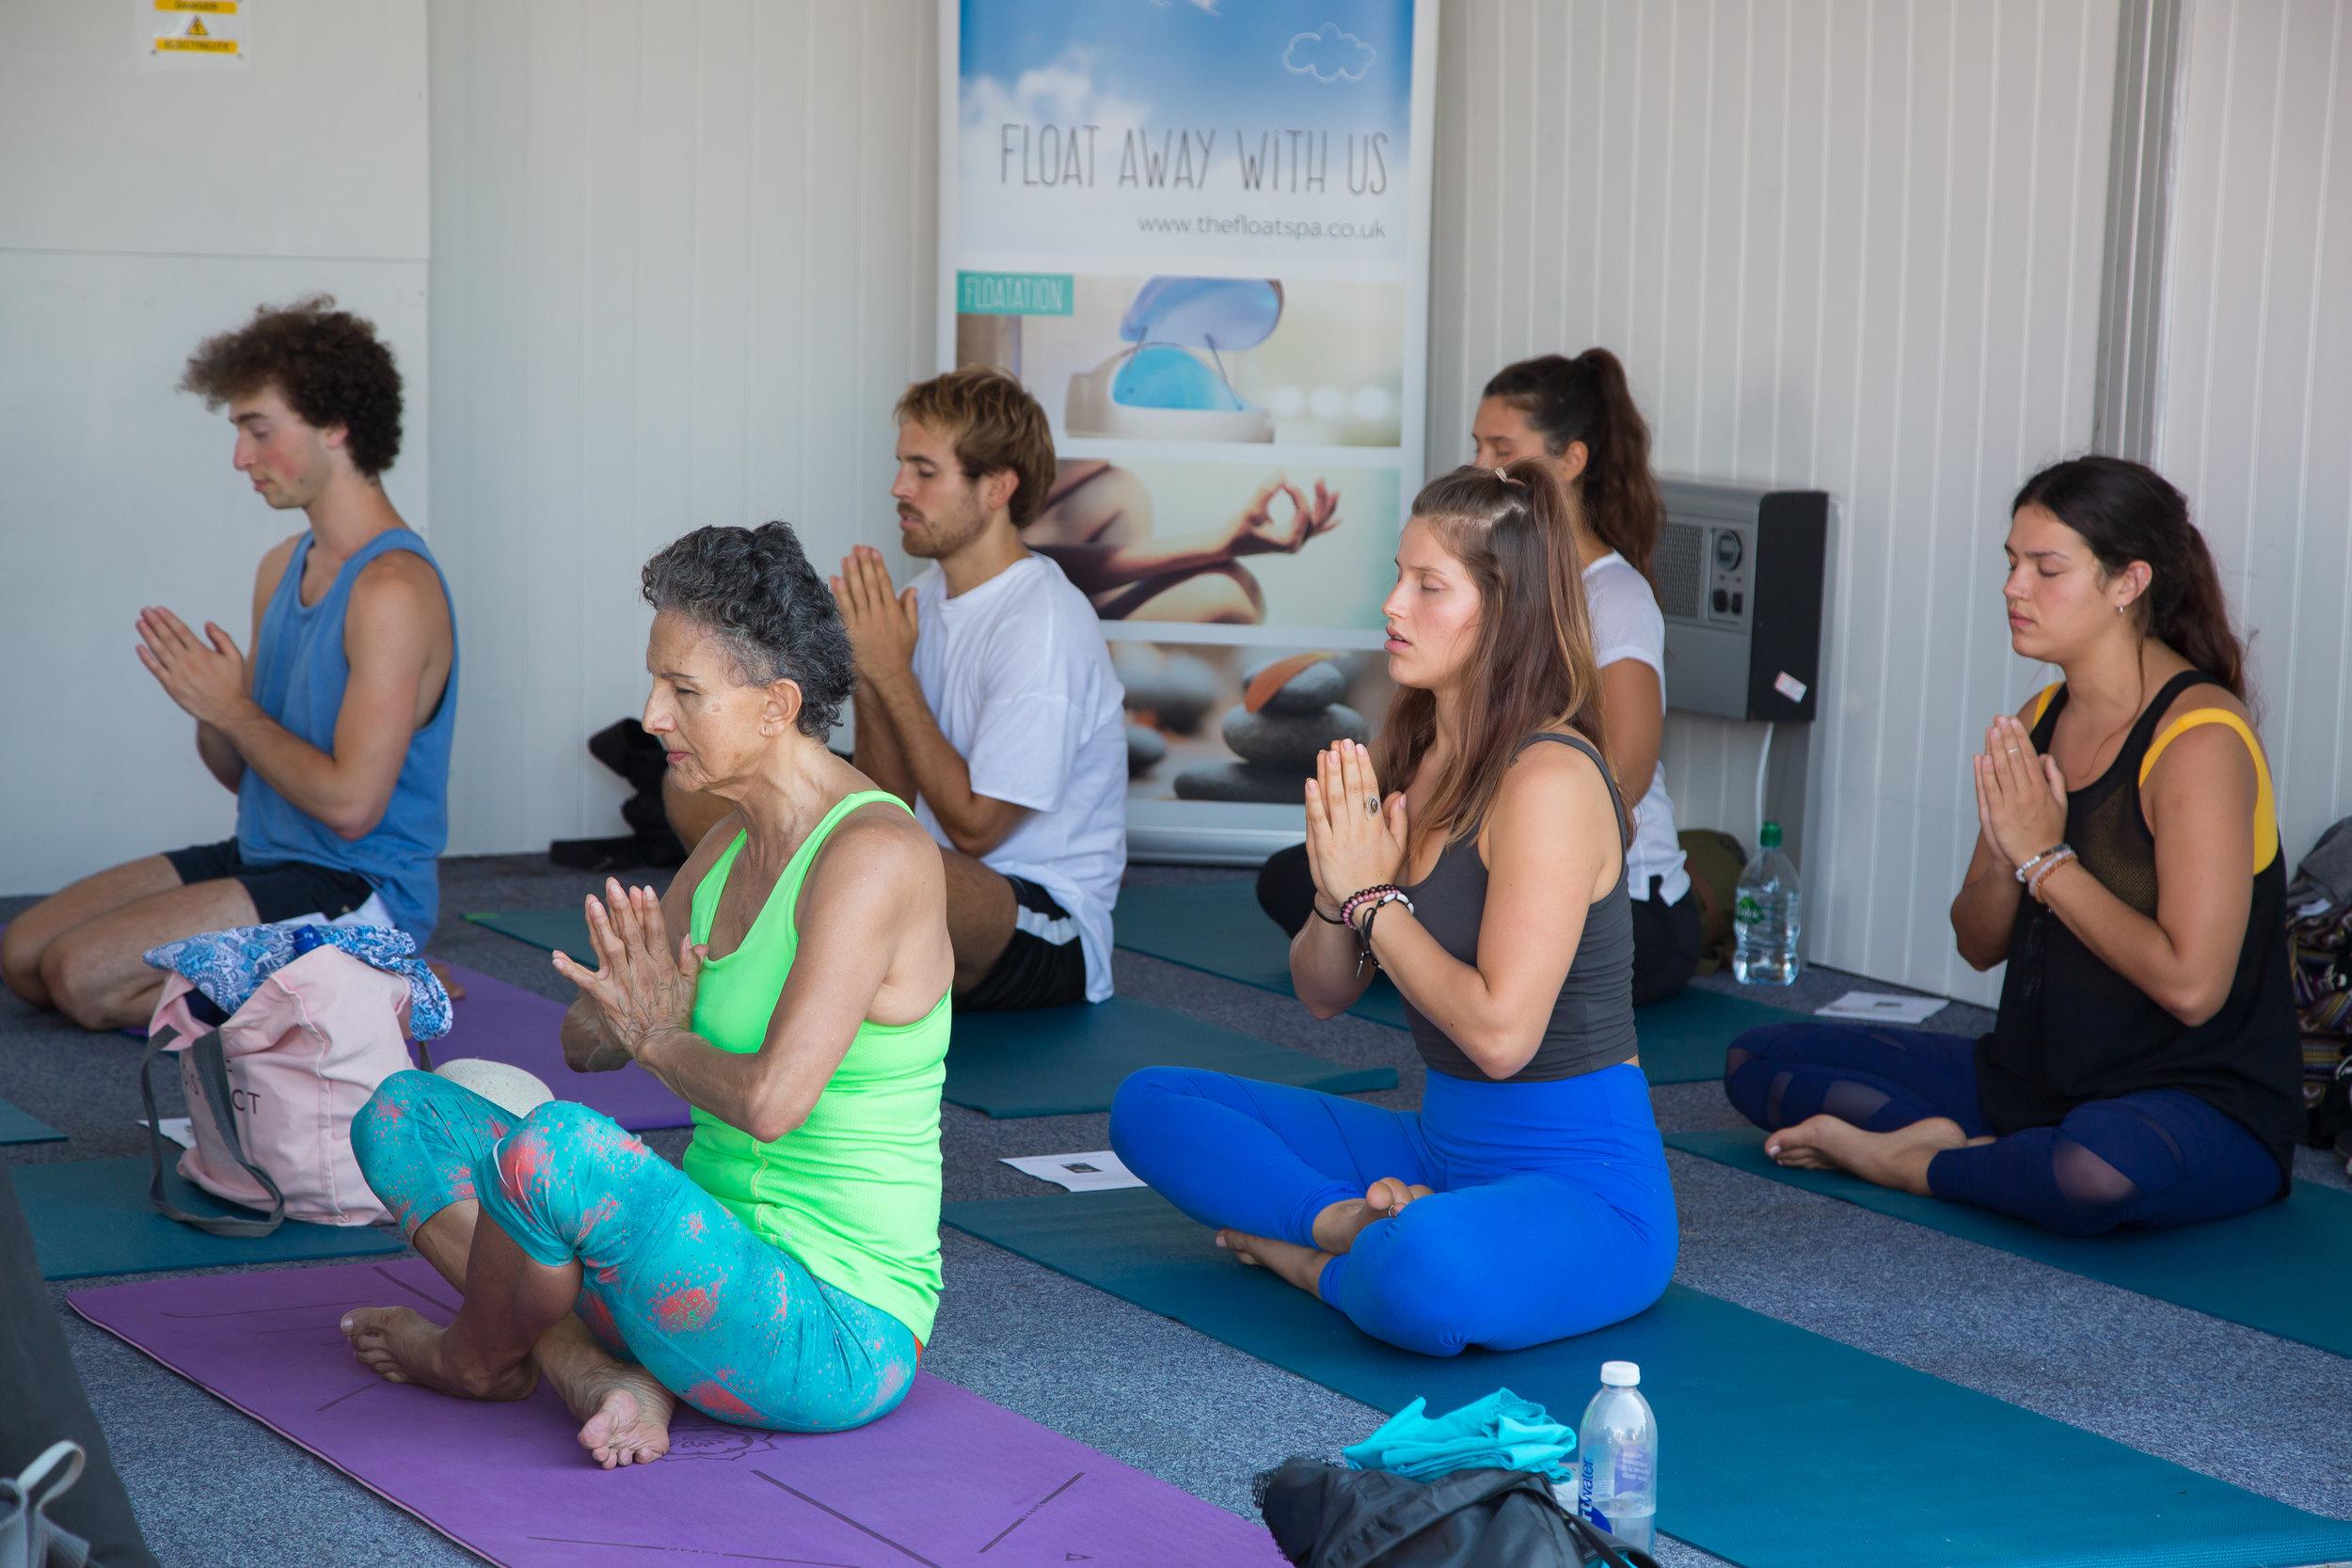 brighton girl yoga festival 2019